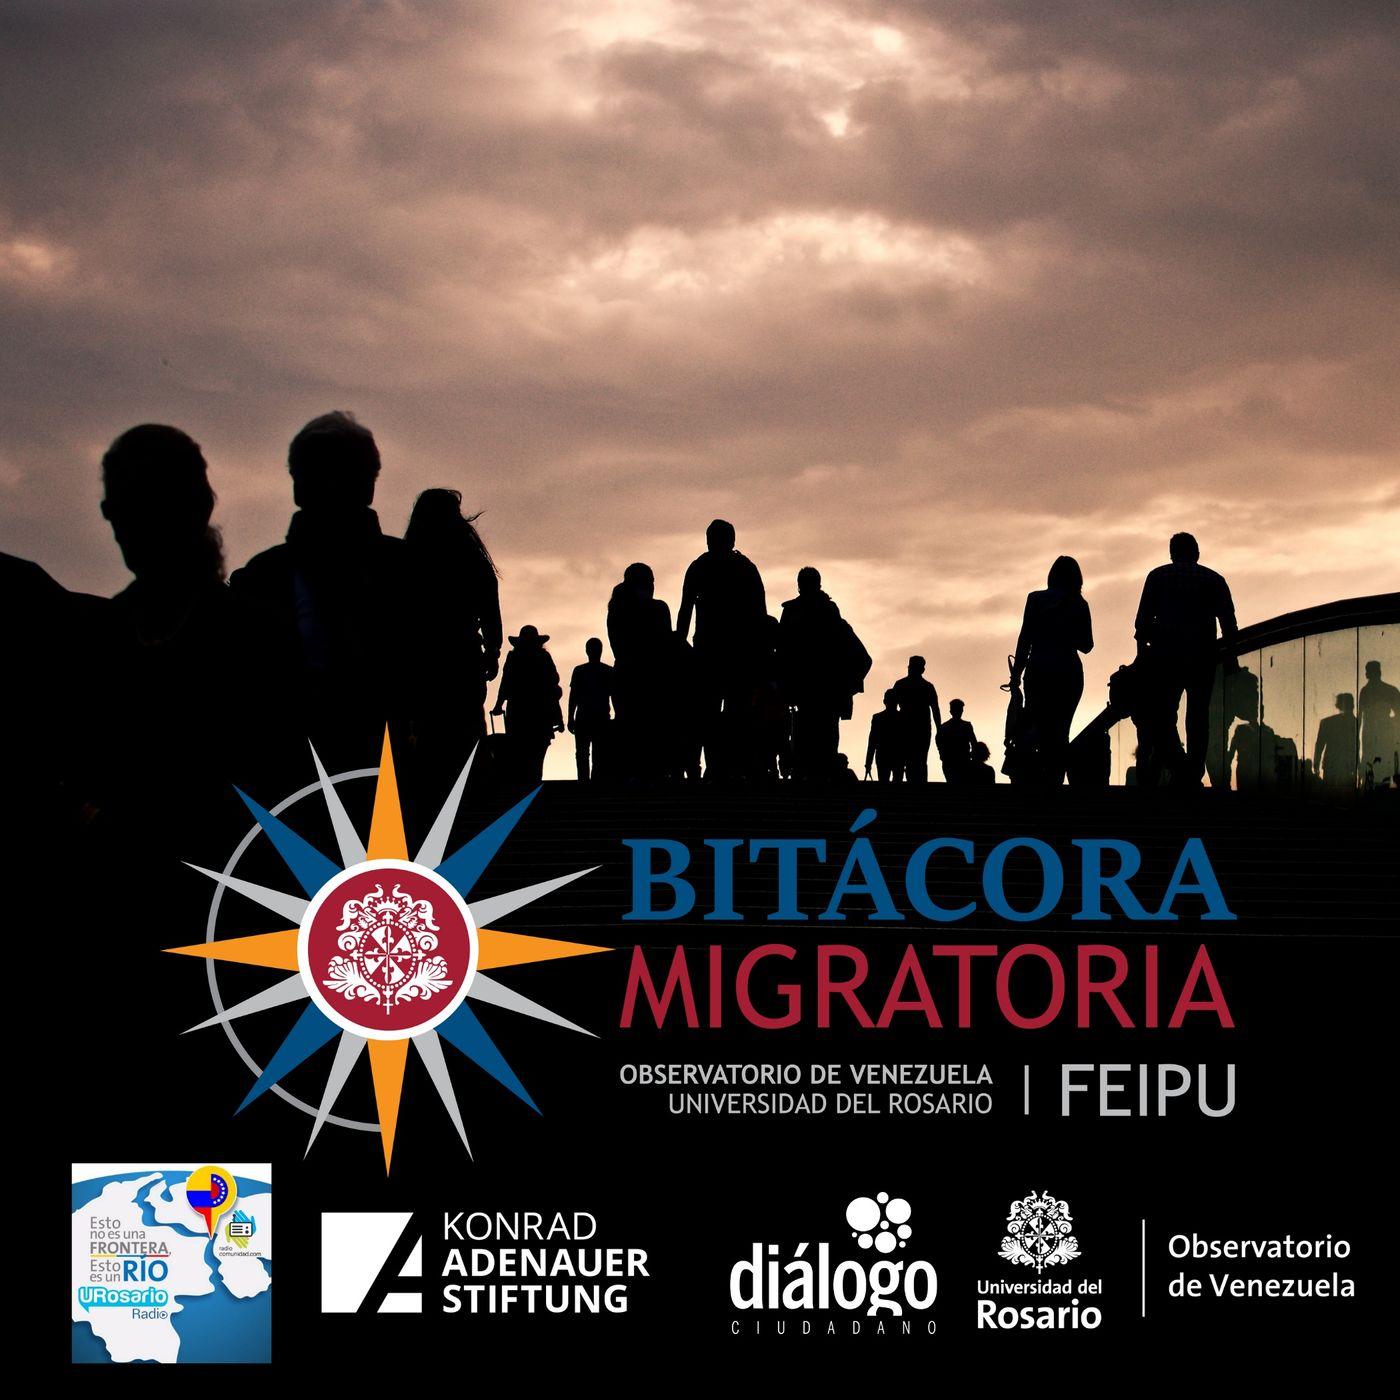 Bitácora Migratoria